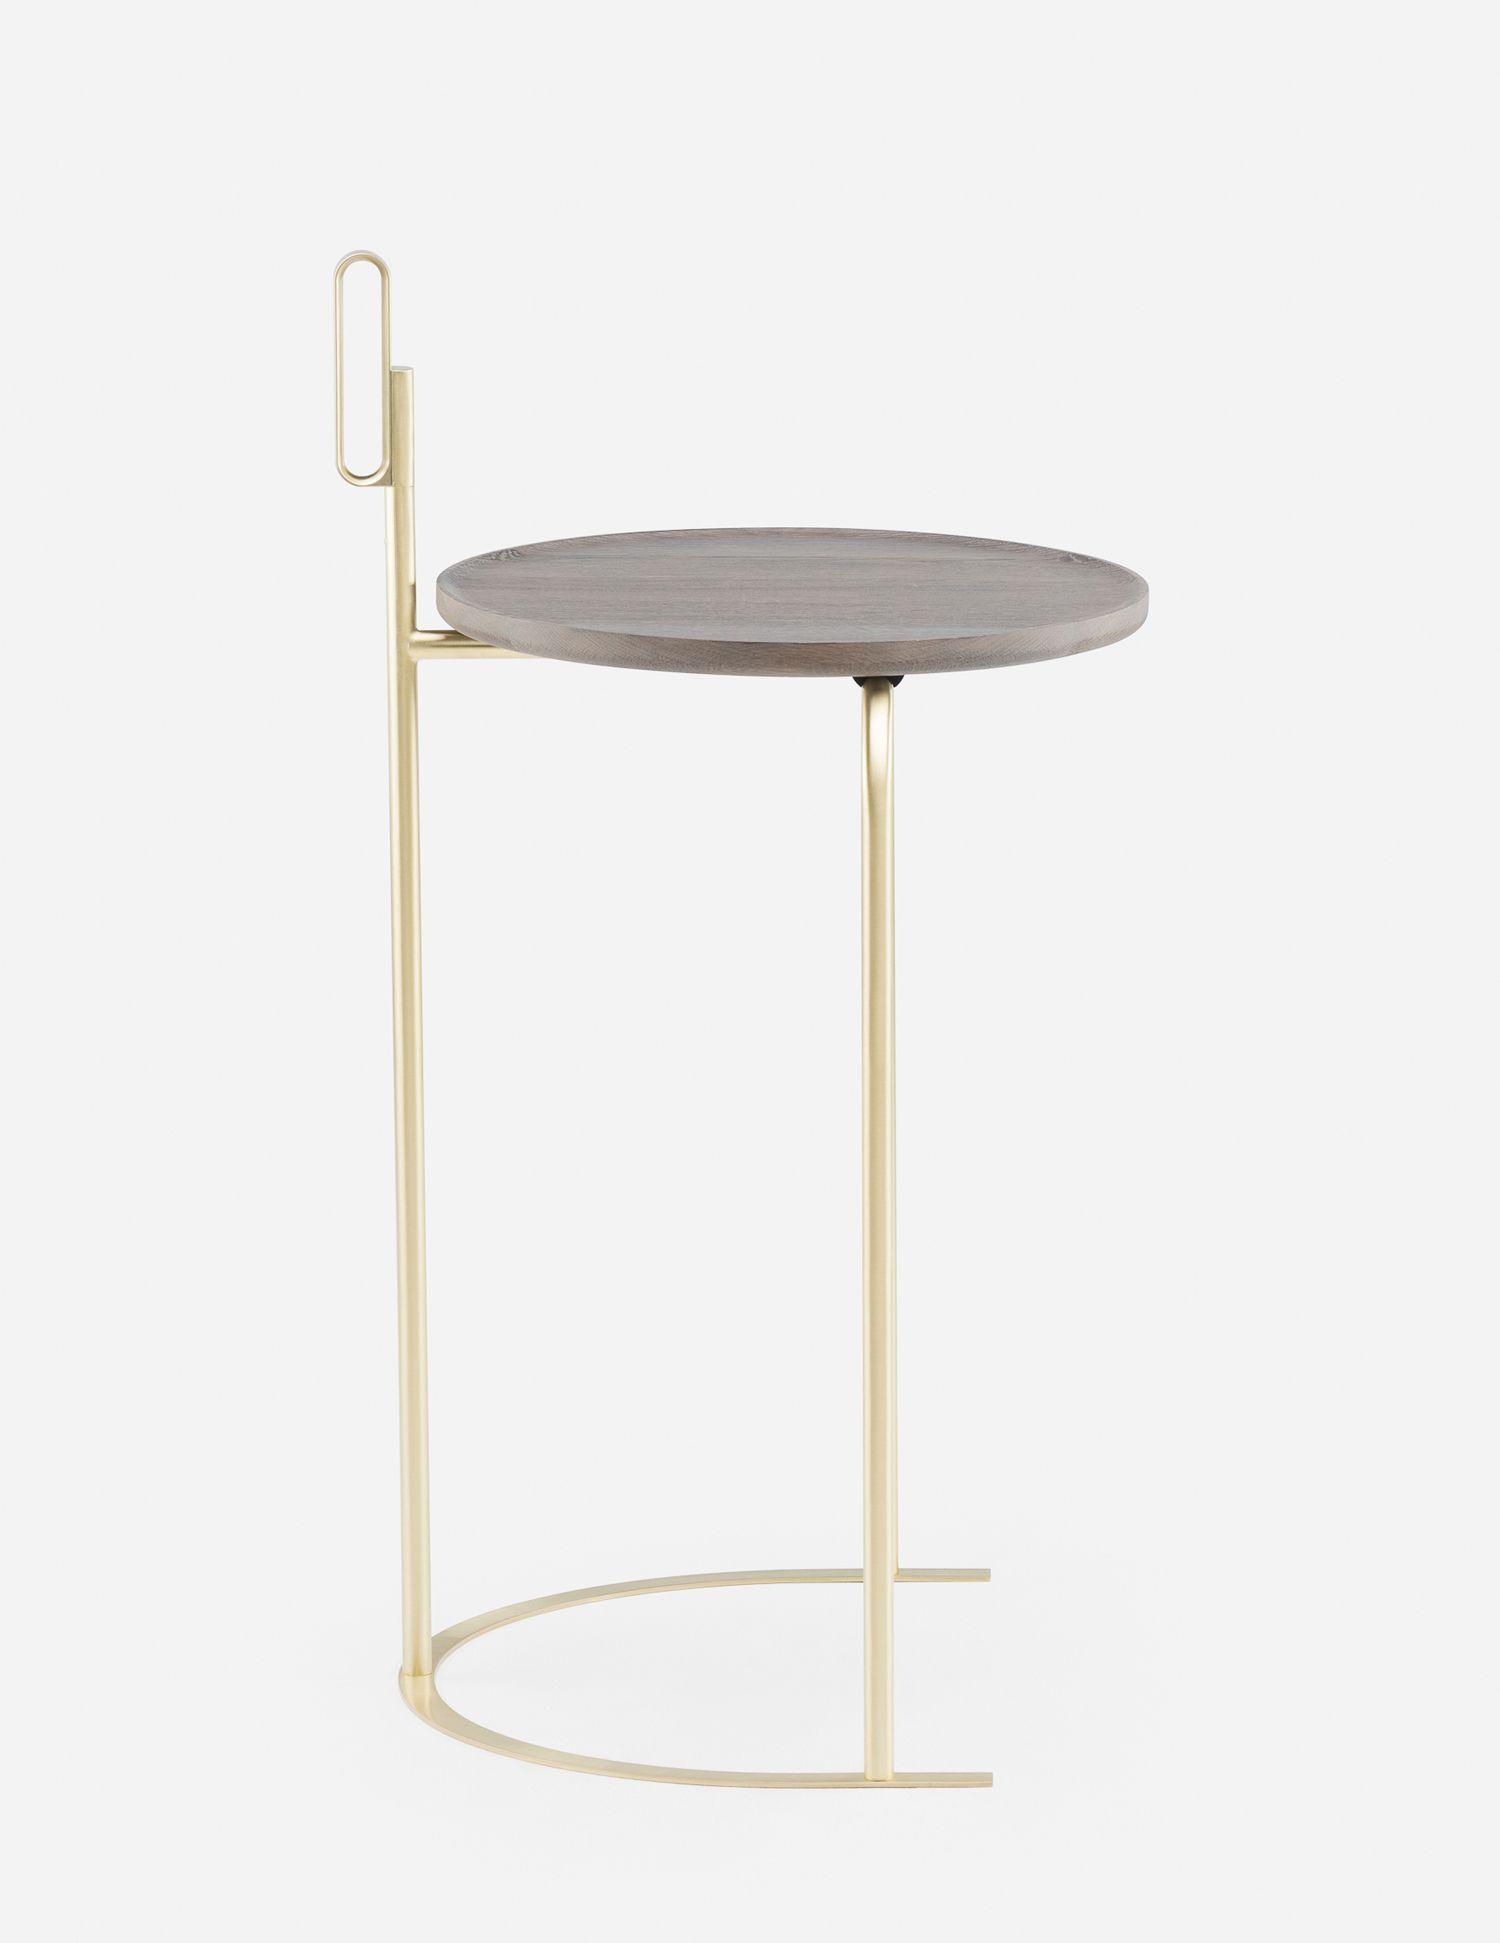 fa414c2f79eb24f228d87833e7da503f Luxe De Table Tres Basse Conception